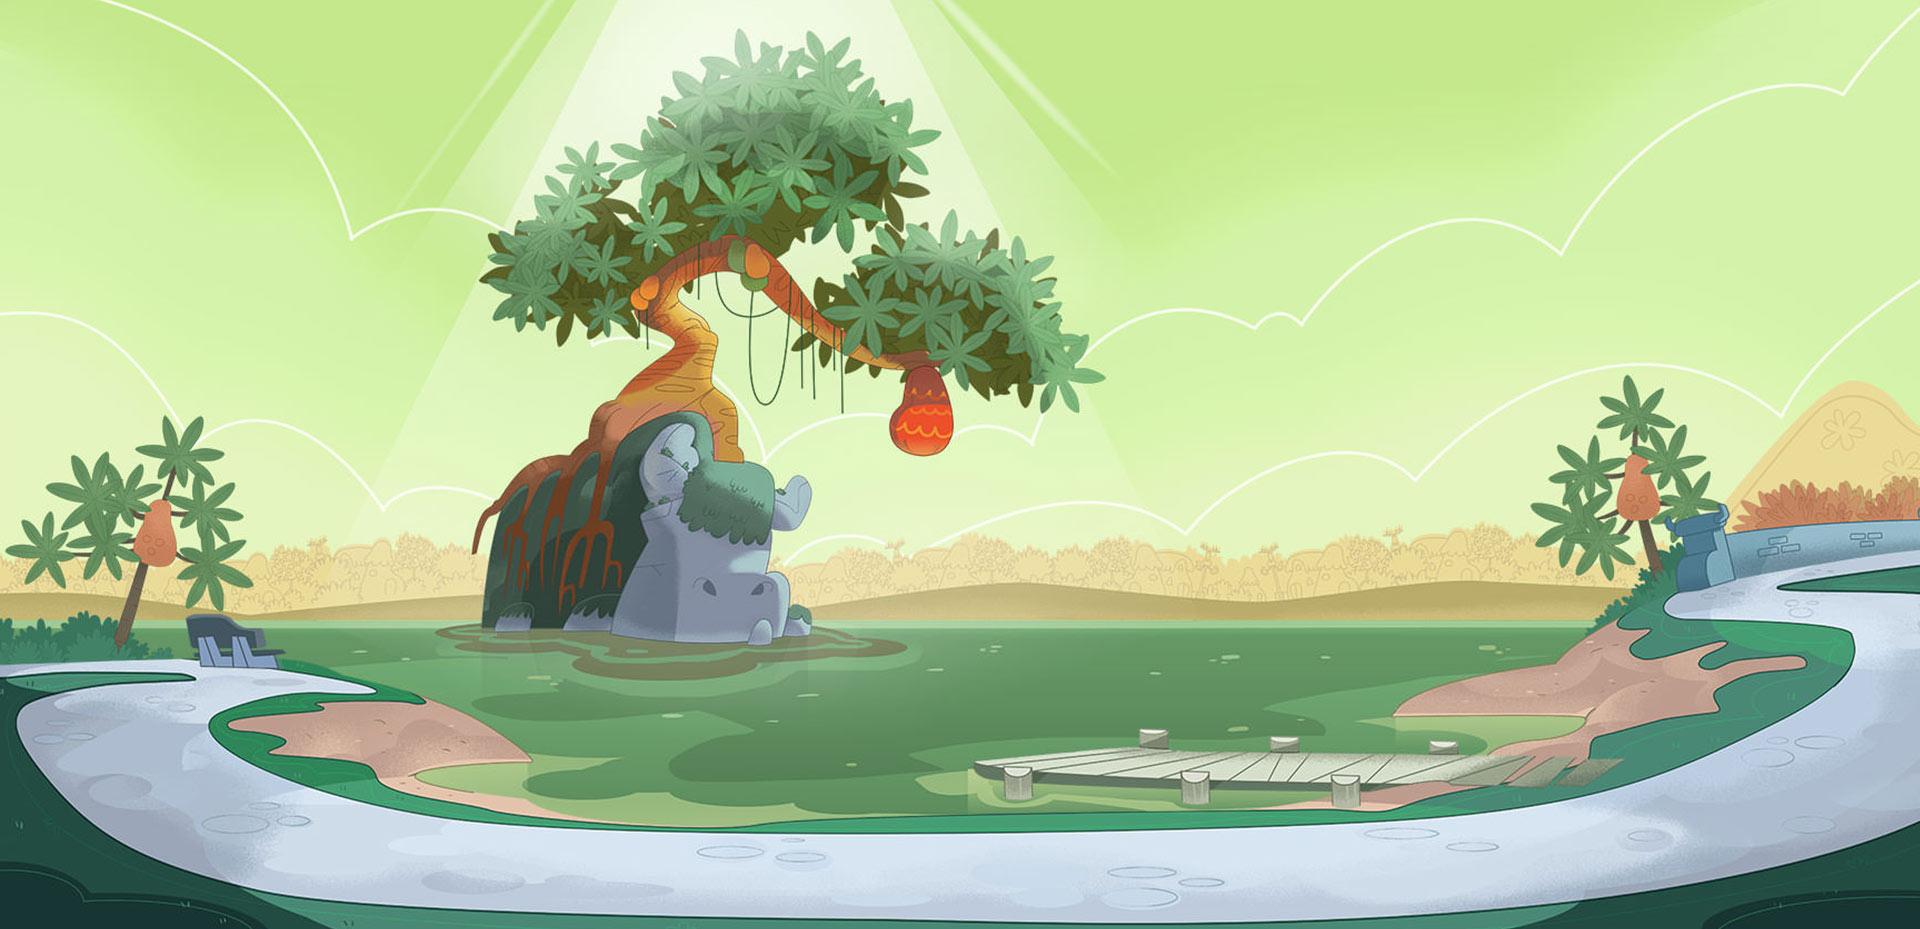 services_background_lagoa_papaya_cartoon_52as.jpg